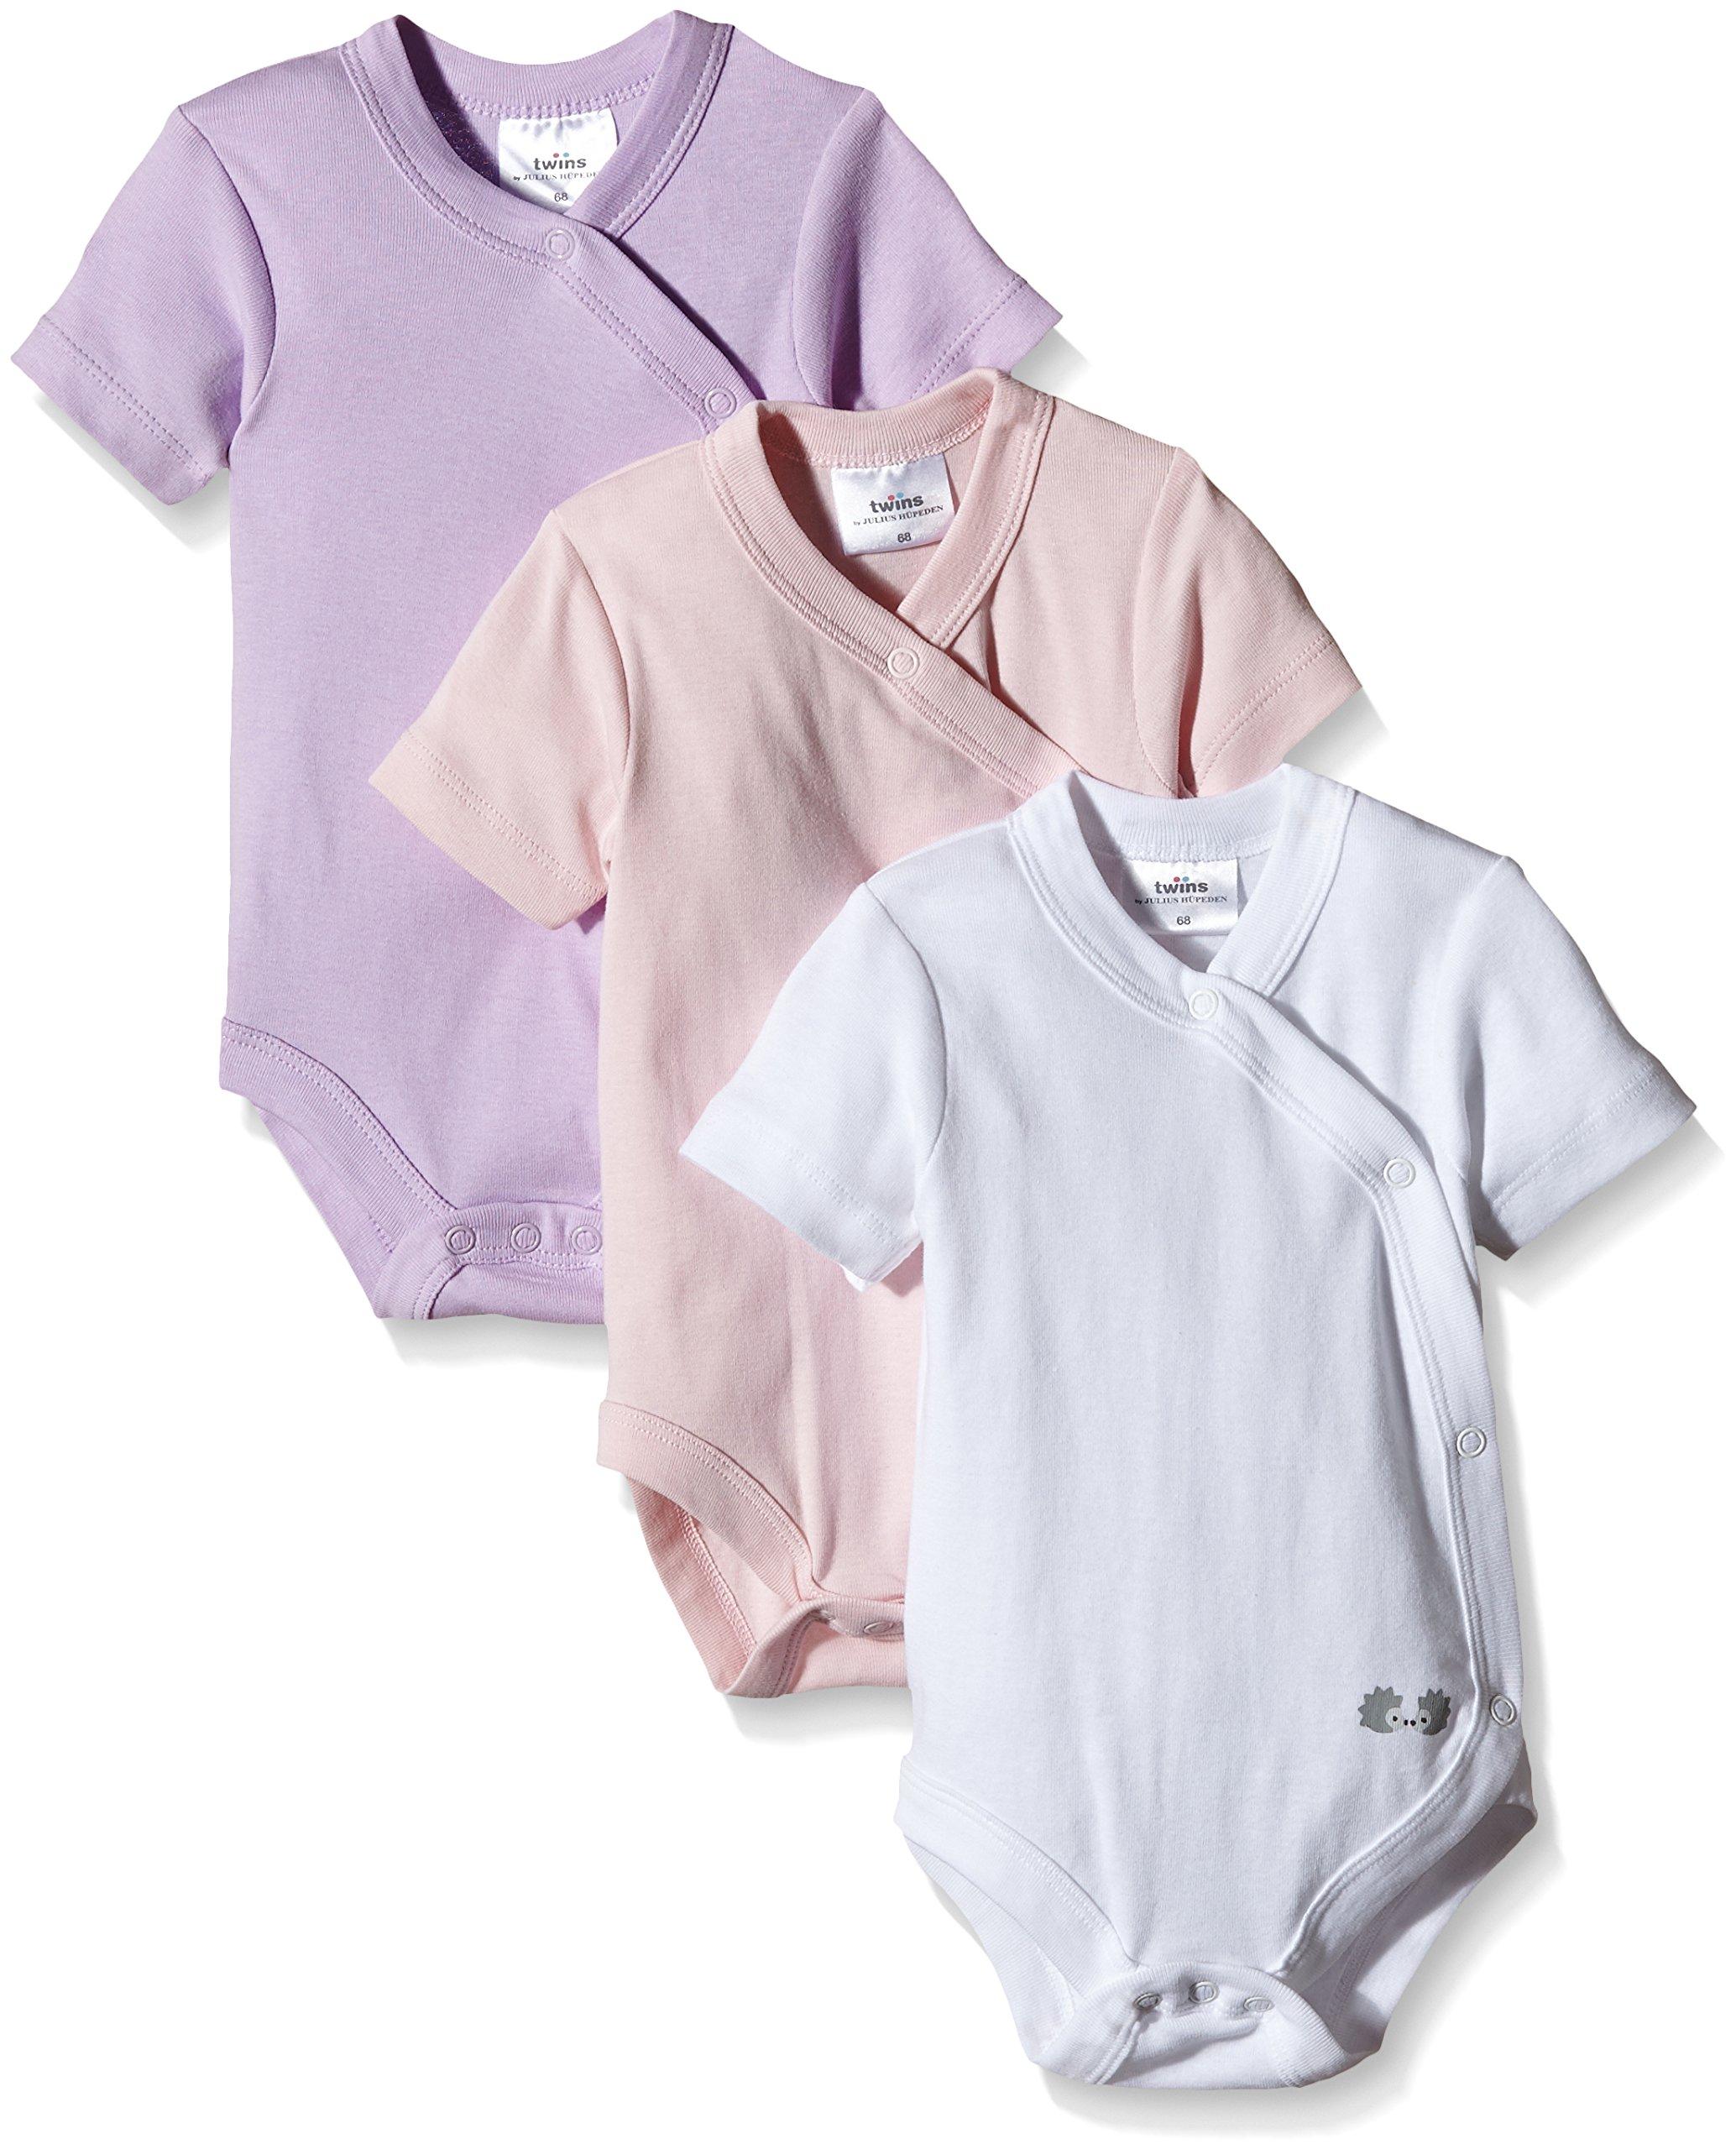 Twins Wickelbody, Kurzarm, uni – 3er-Pack – Body para bebés